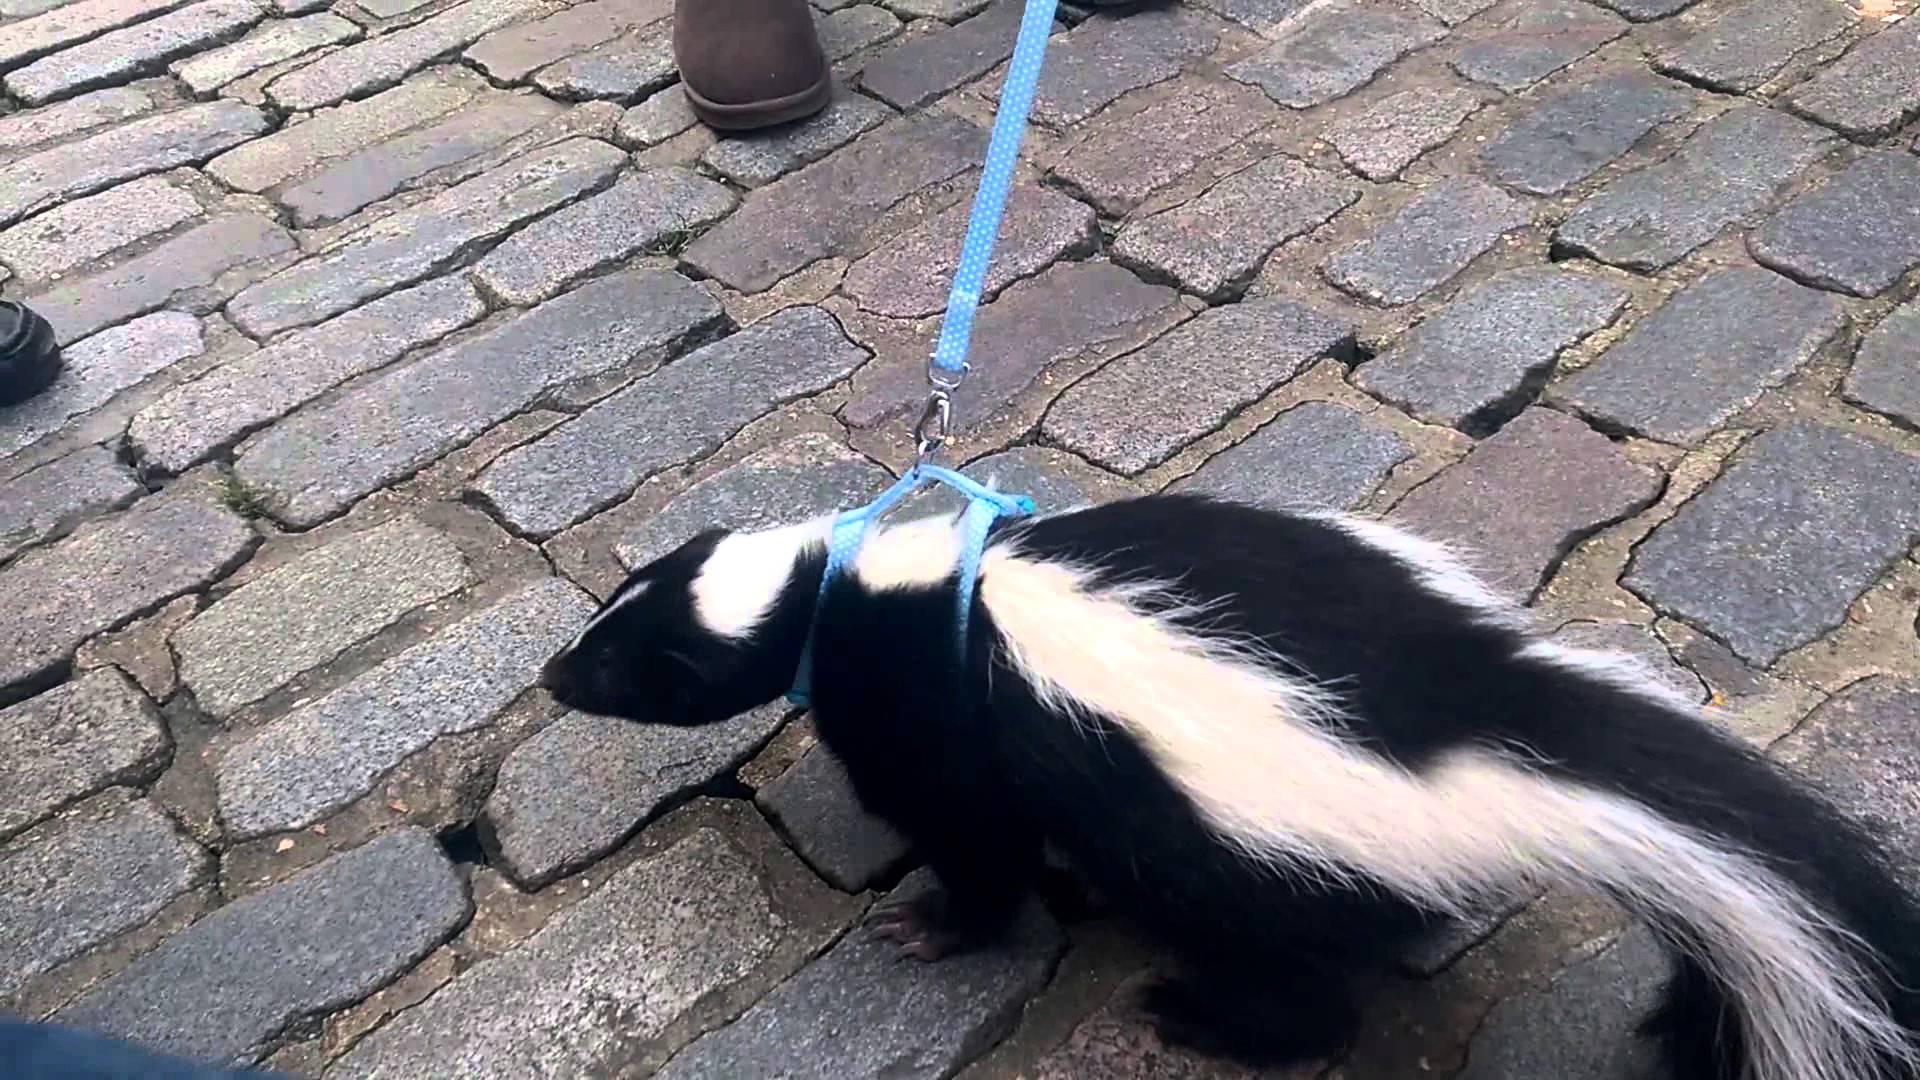 Considering a Pet Skunk? - Skunk.com